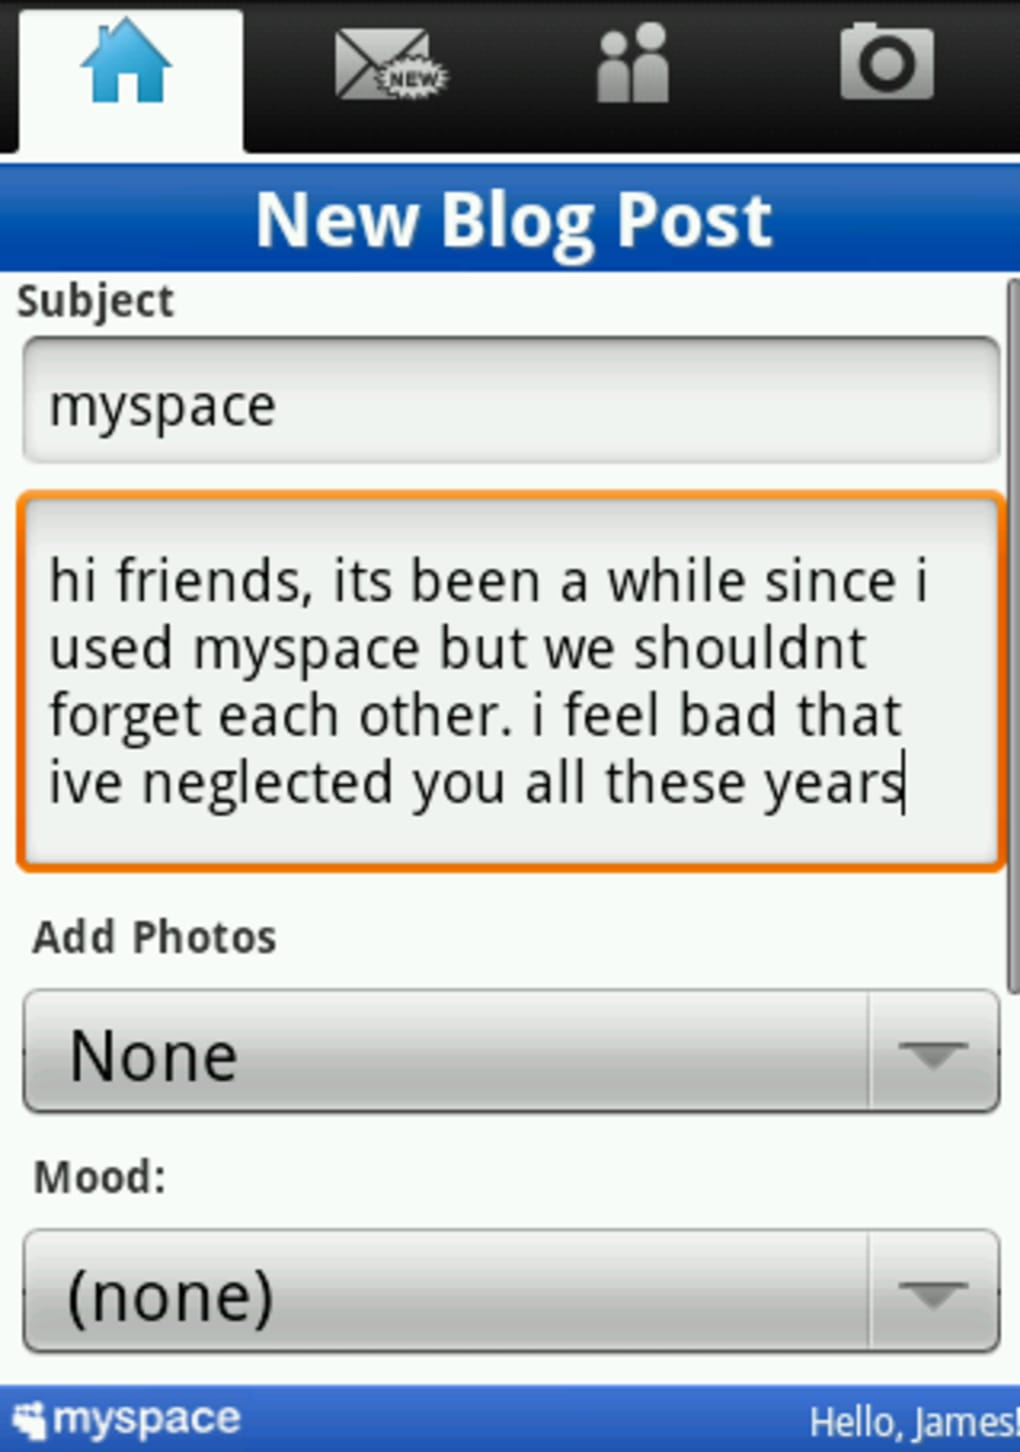 Myspace application